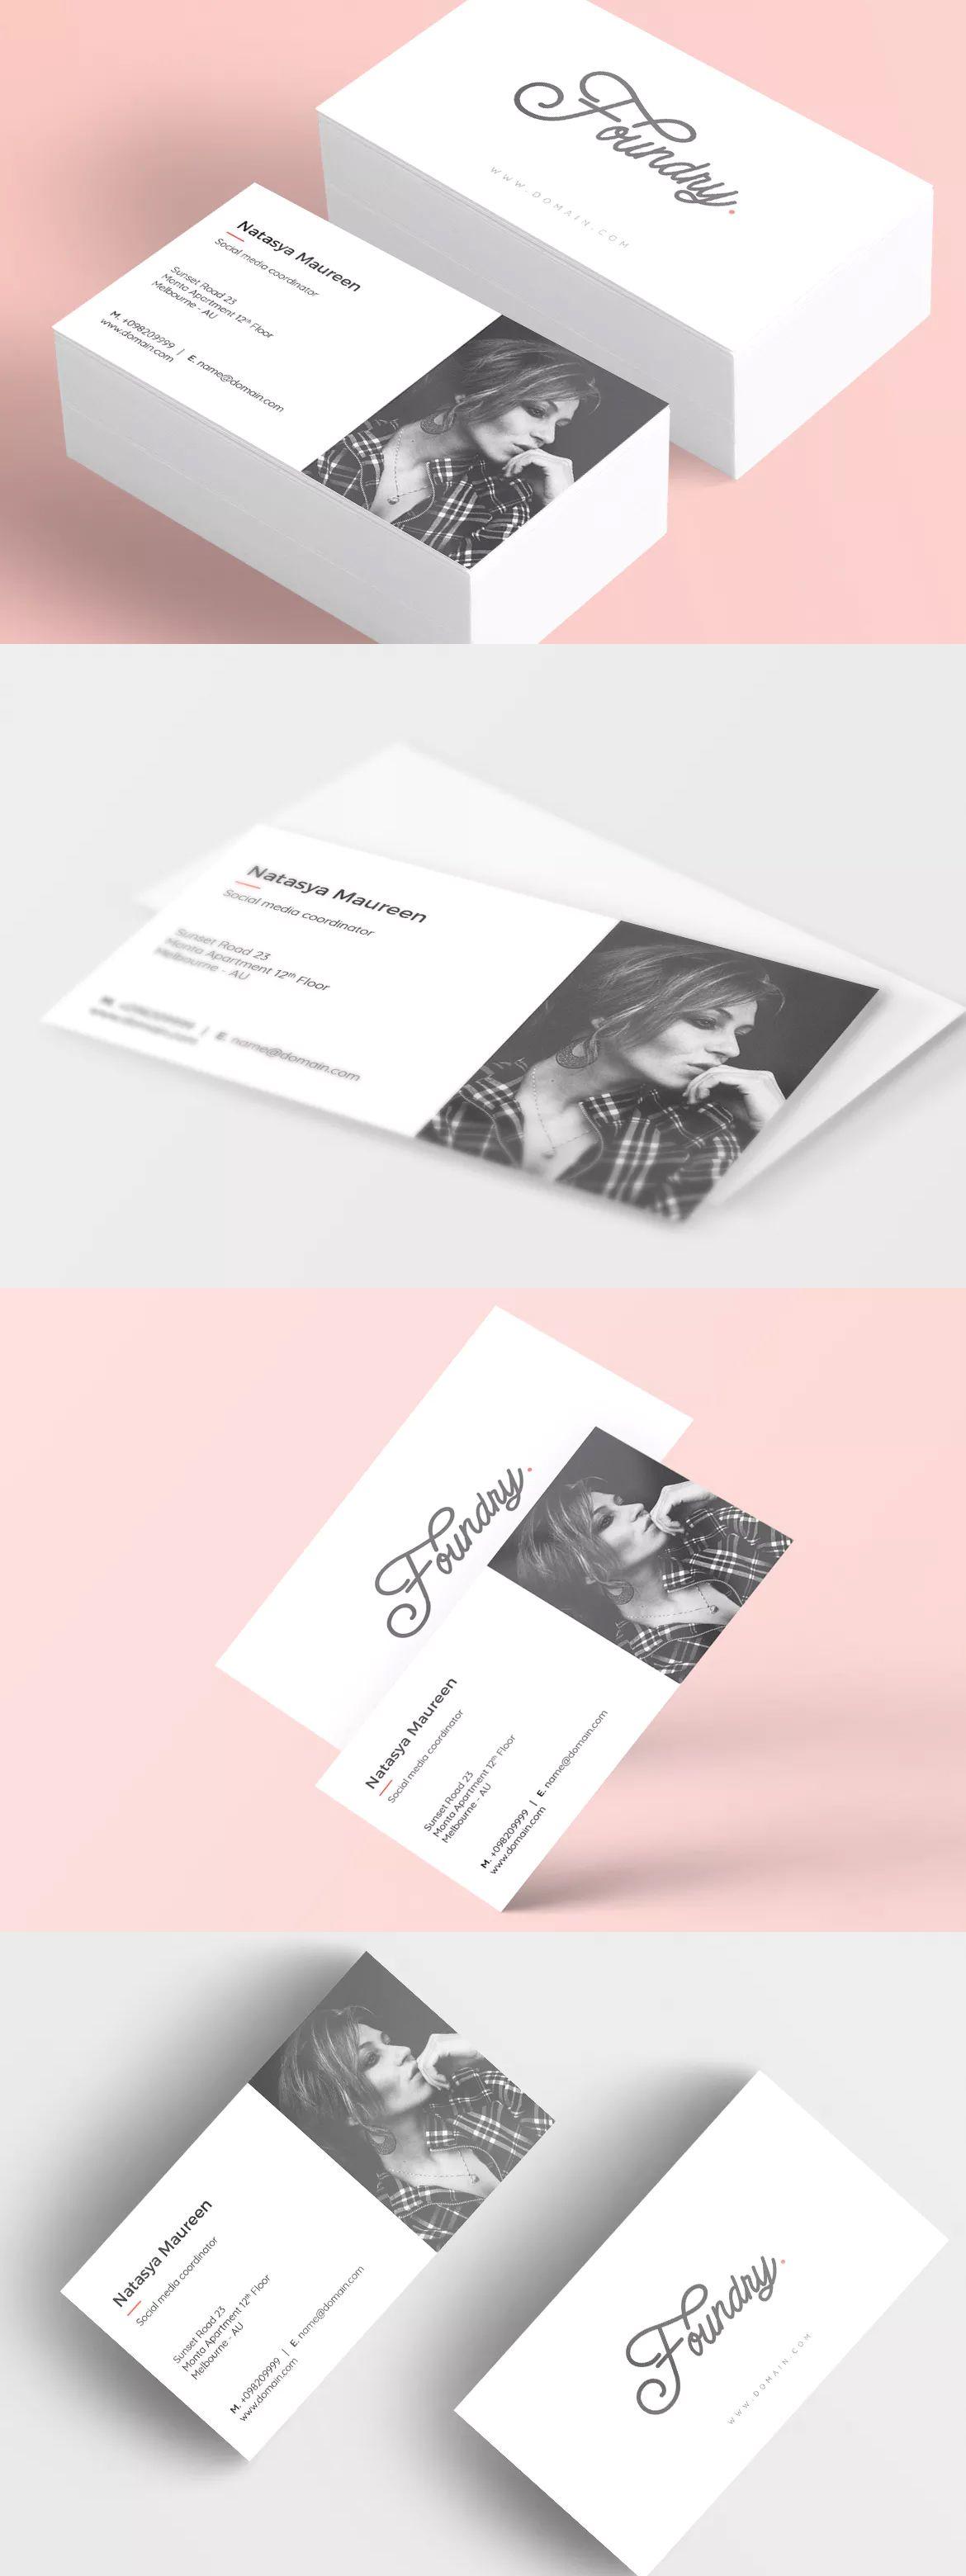 Foundry creative business card template psd business card ideas foundry creative business card template psd flashek Gallery